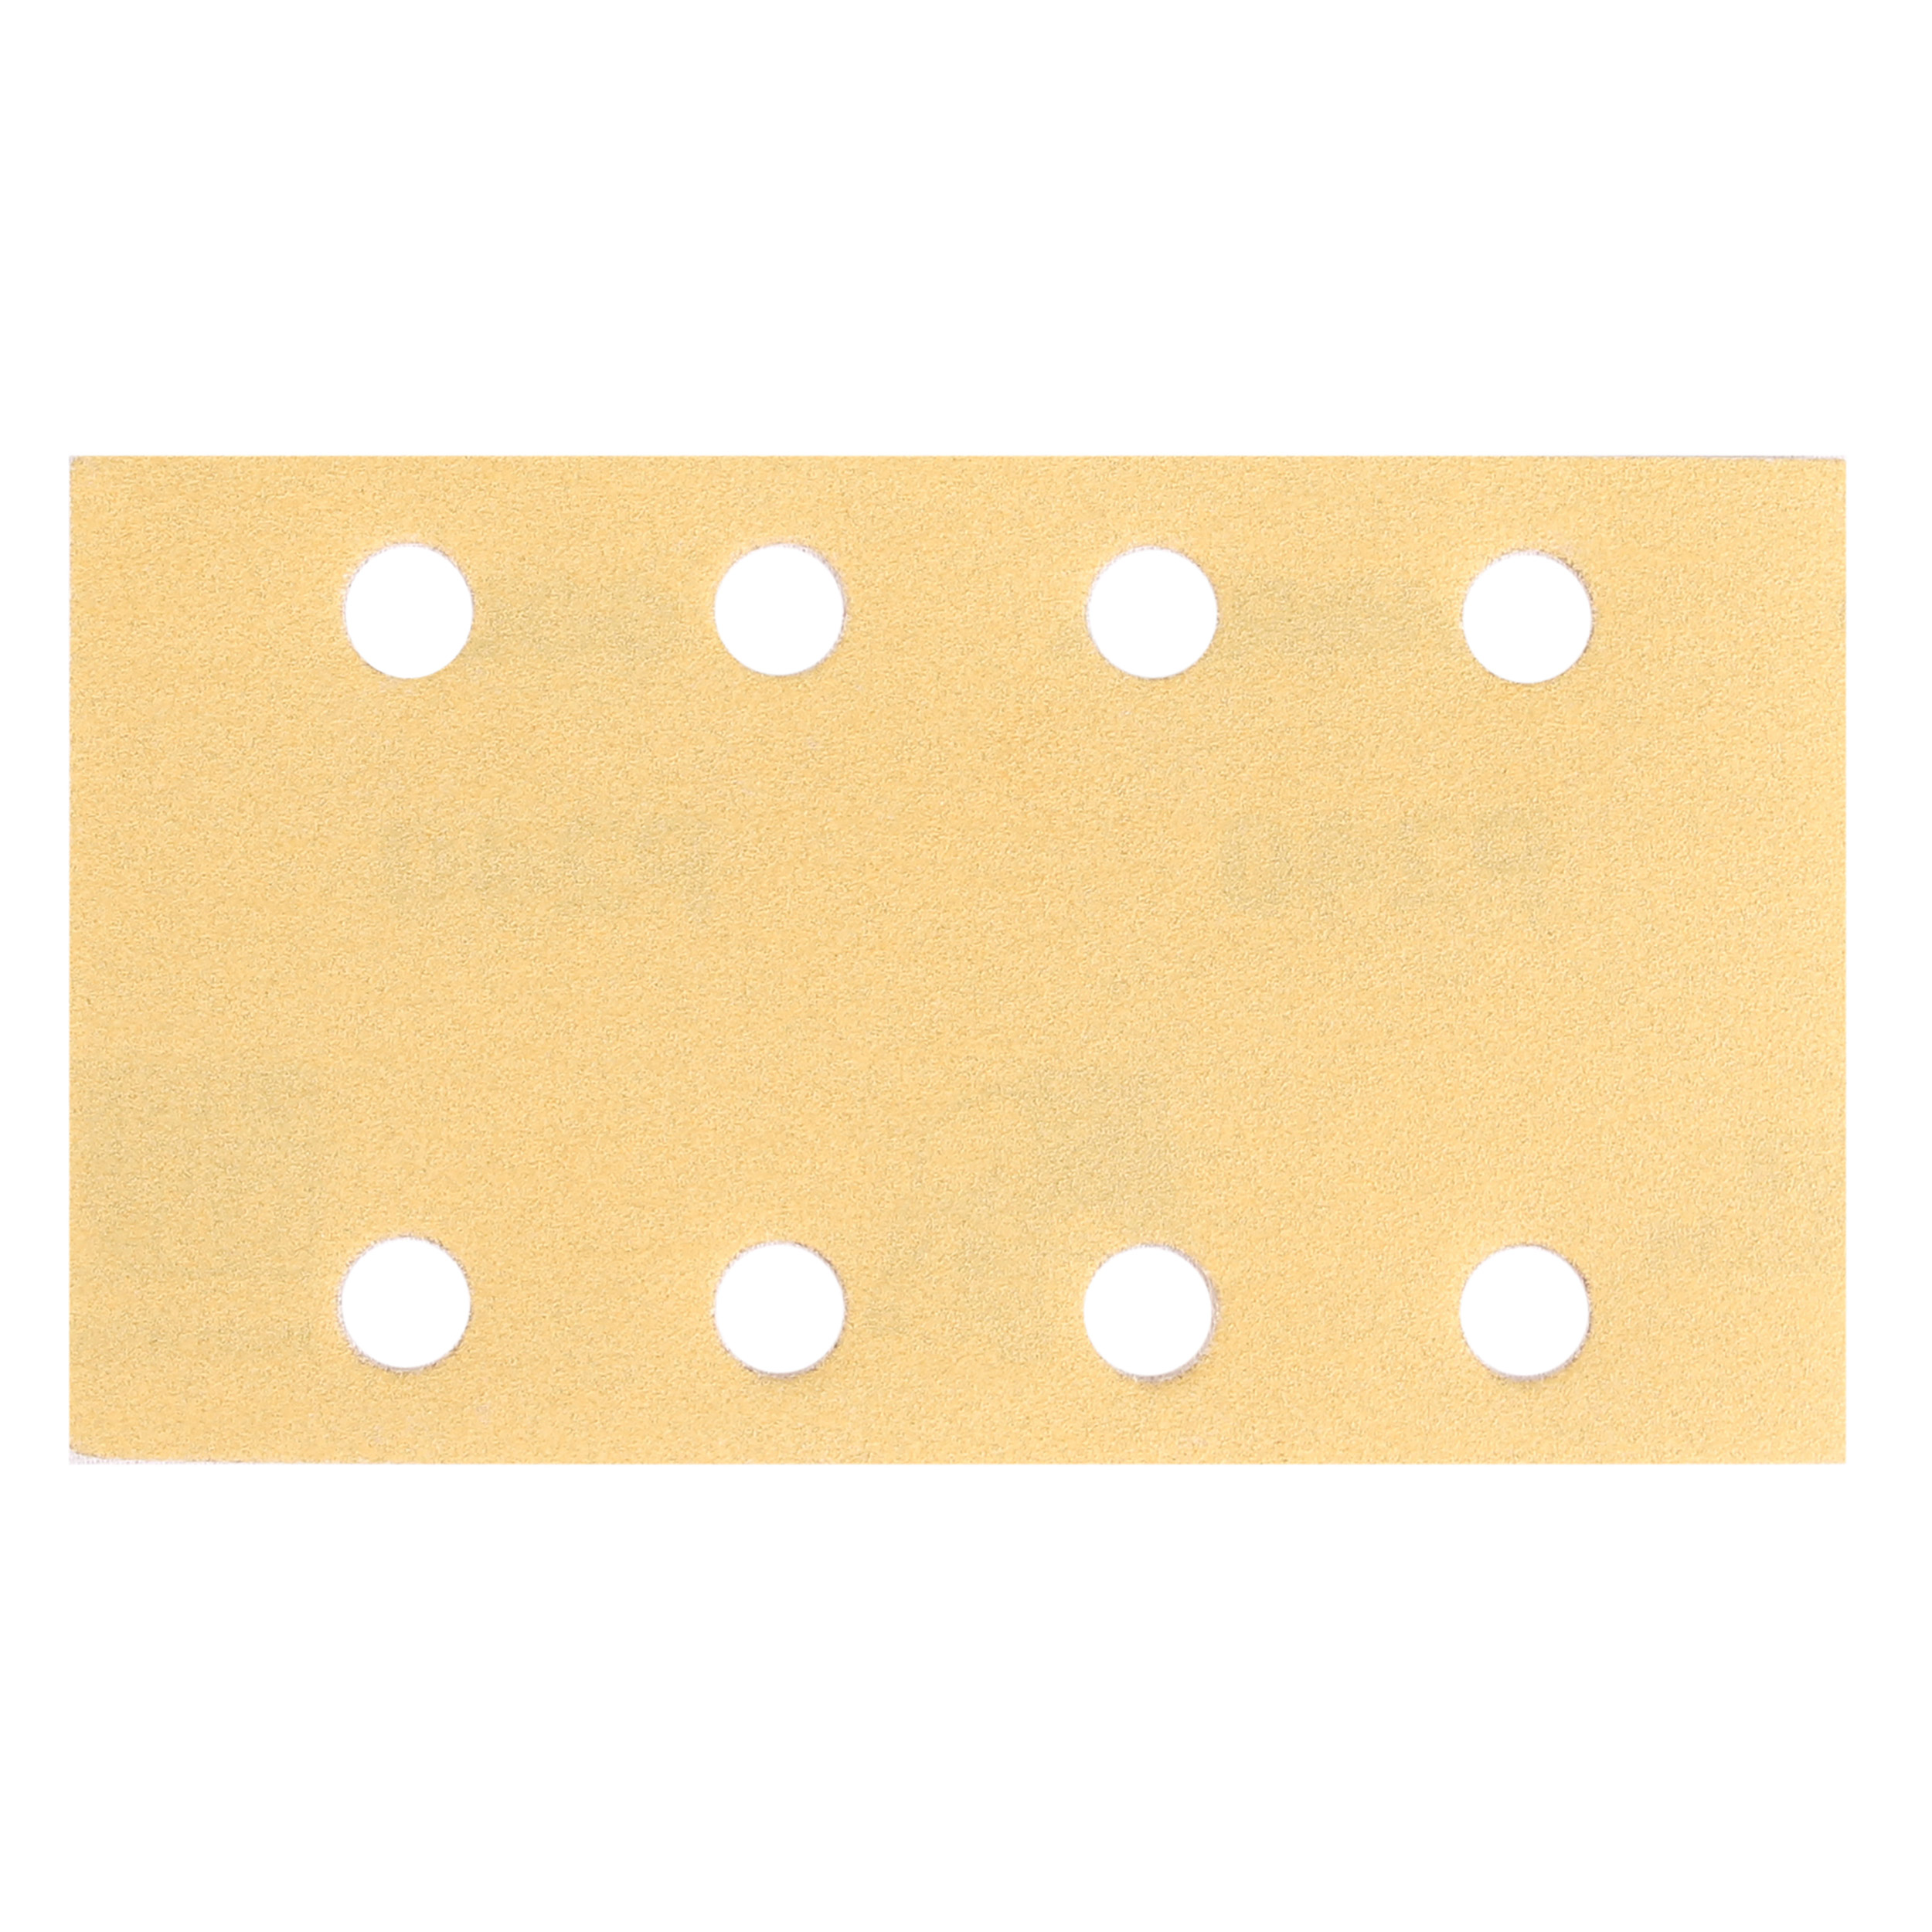 "GOLD 3""x5"" Grip Sandpaper, 8H P120, 50 Sheets/Box"